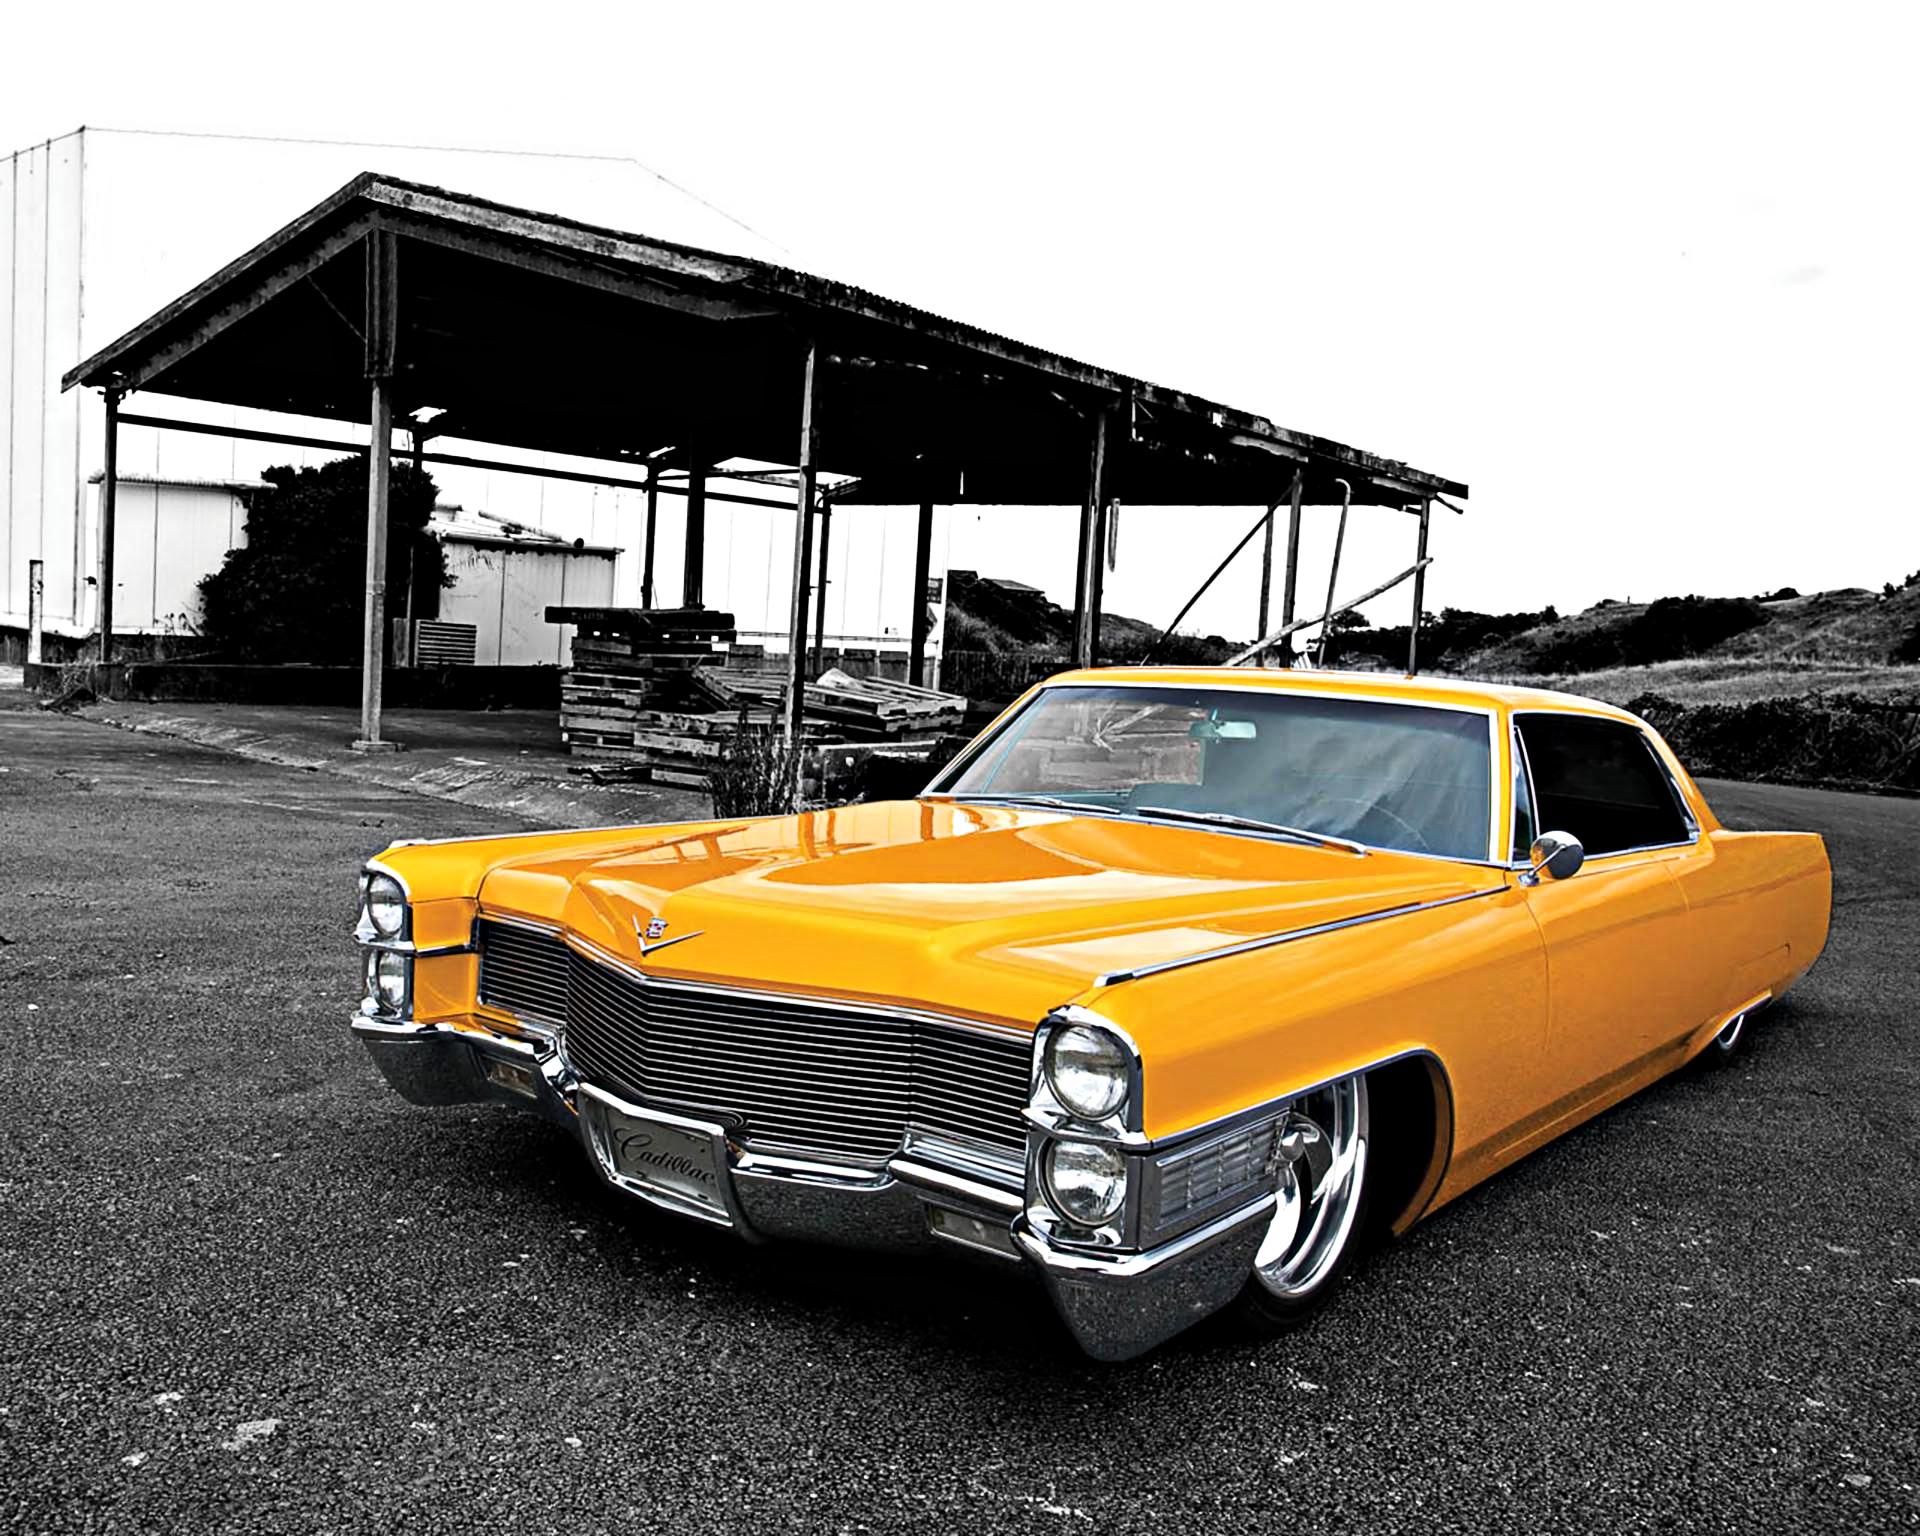 Cadillac full hd wallpaper and background 1920x1536 id - Cadillac wallpaper ...